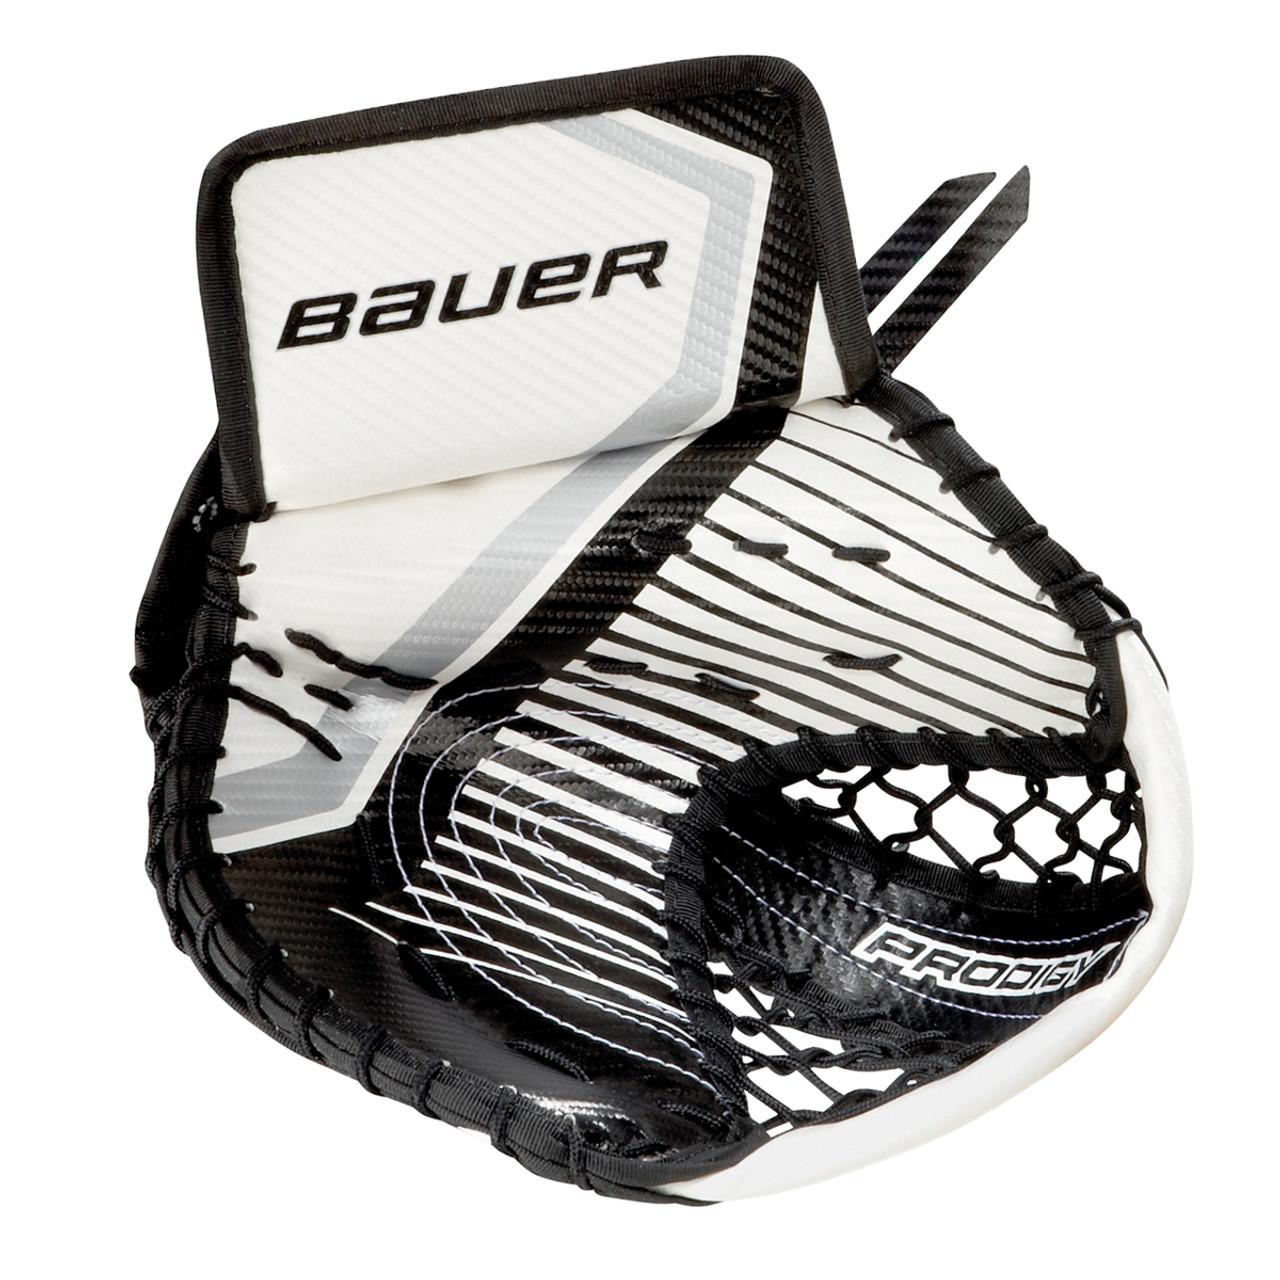 Bauer S17 Prodigy 3 0 Youth Hockey Goalie Catch Glove - White, Black